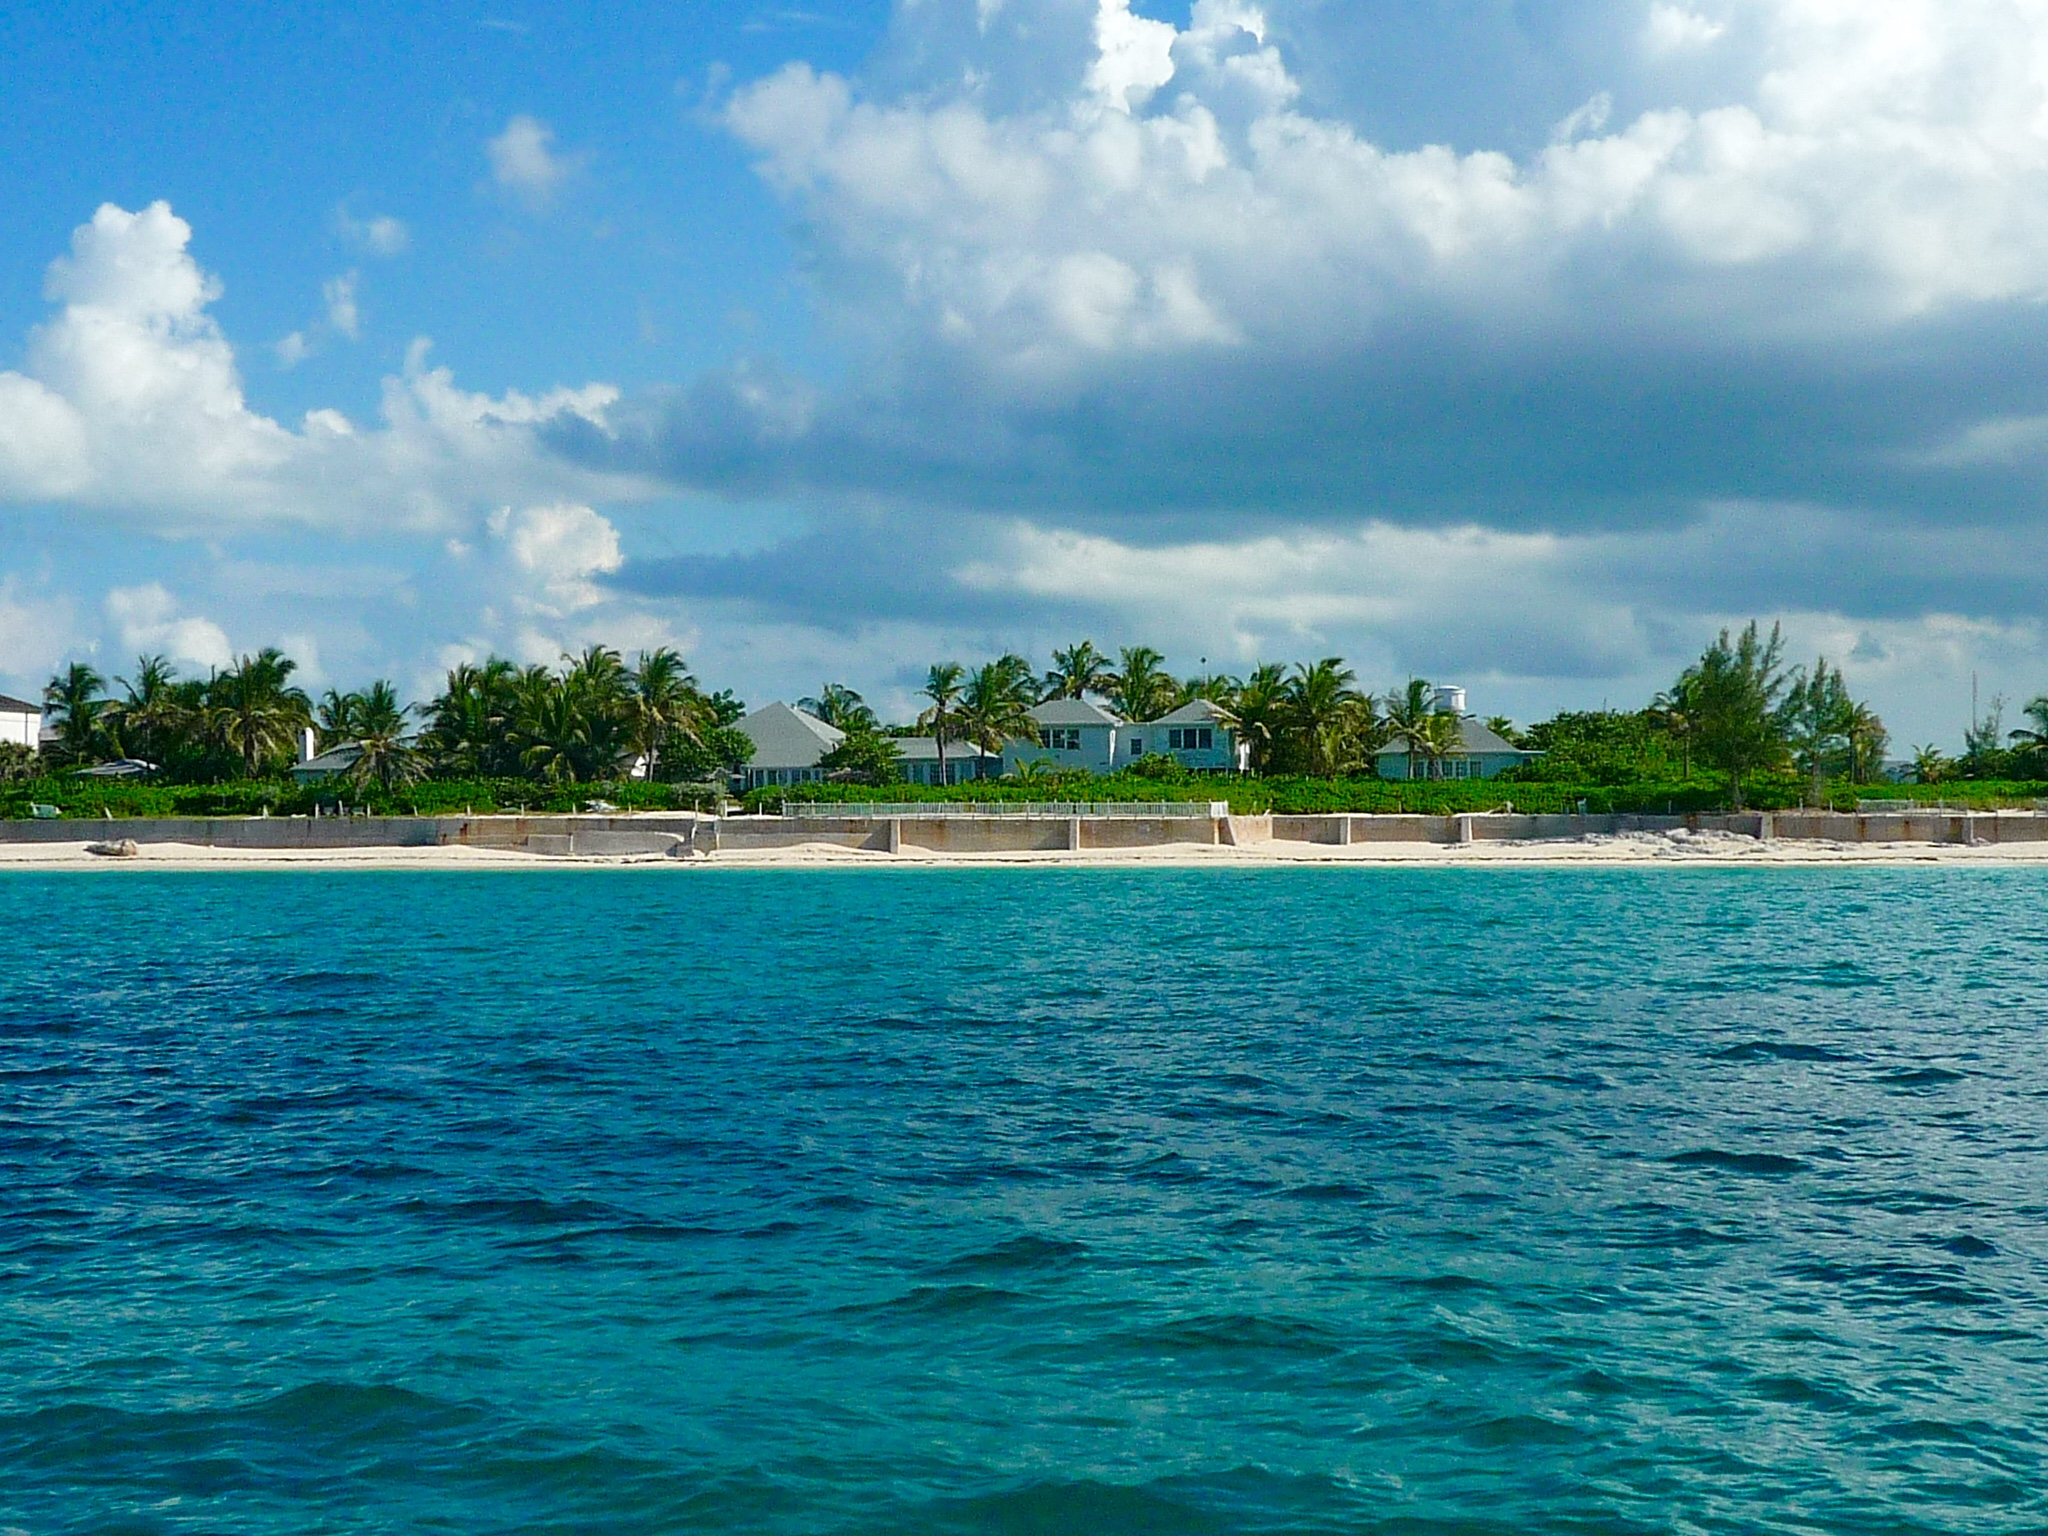 Anderer Wohnungstyp für Verkauf beim Allamanda Paradise Island, New Providence/Nassau Bahamas